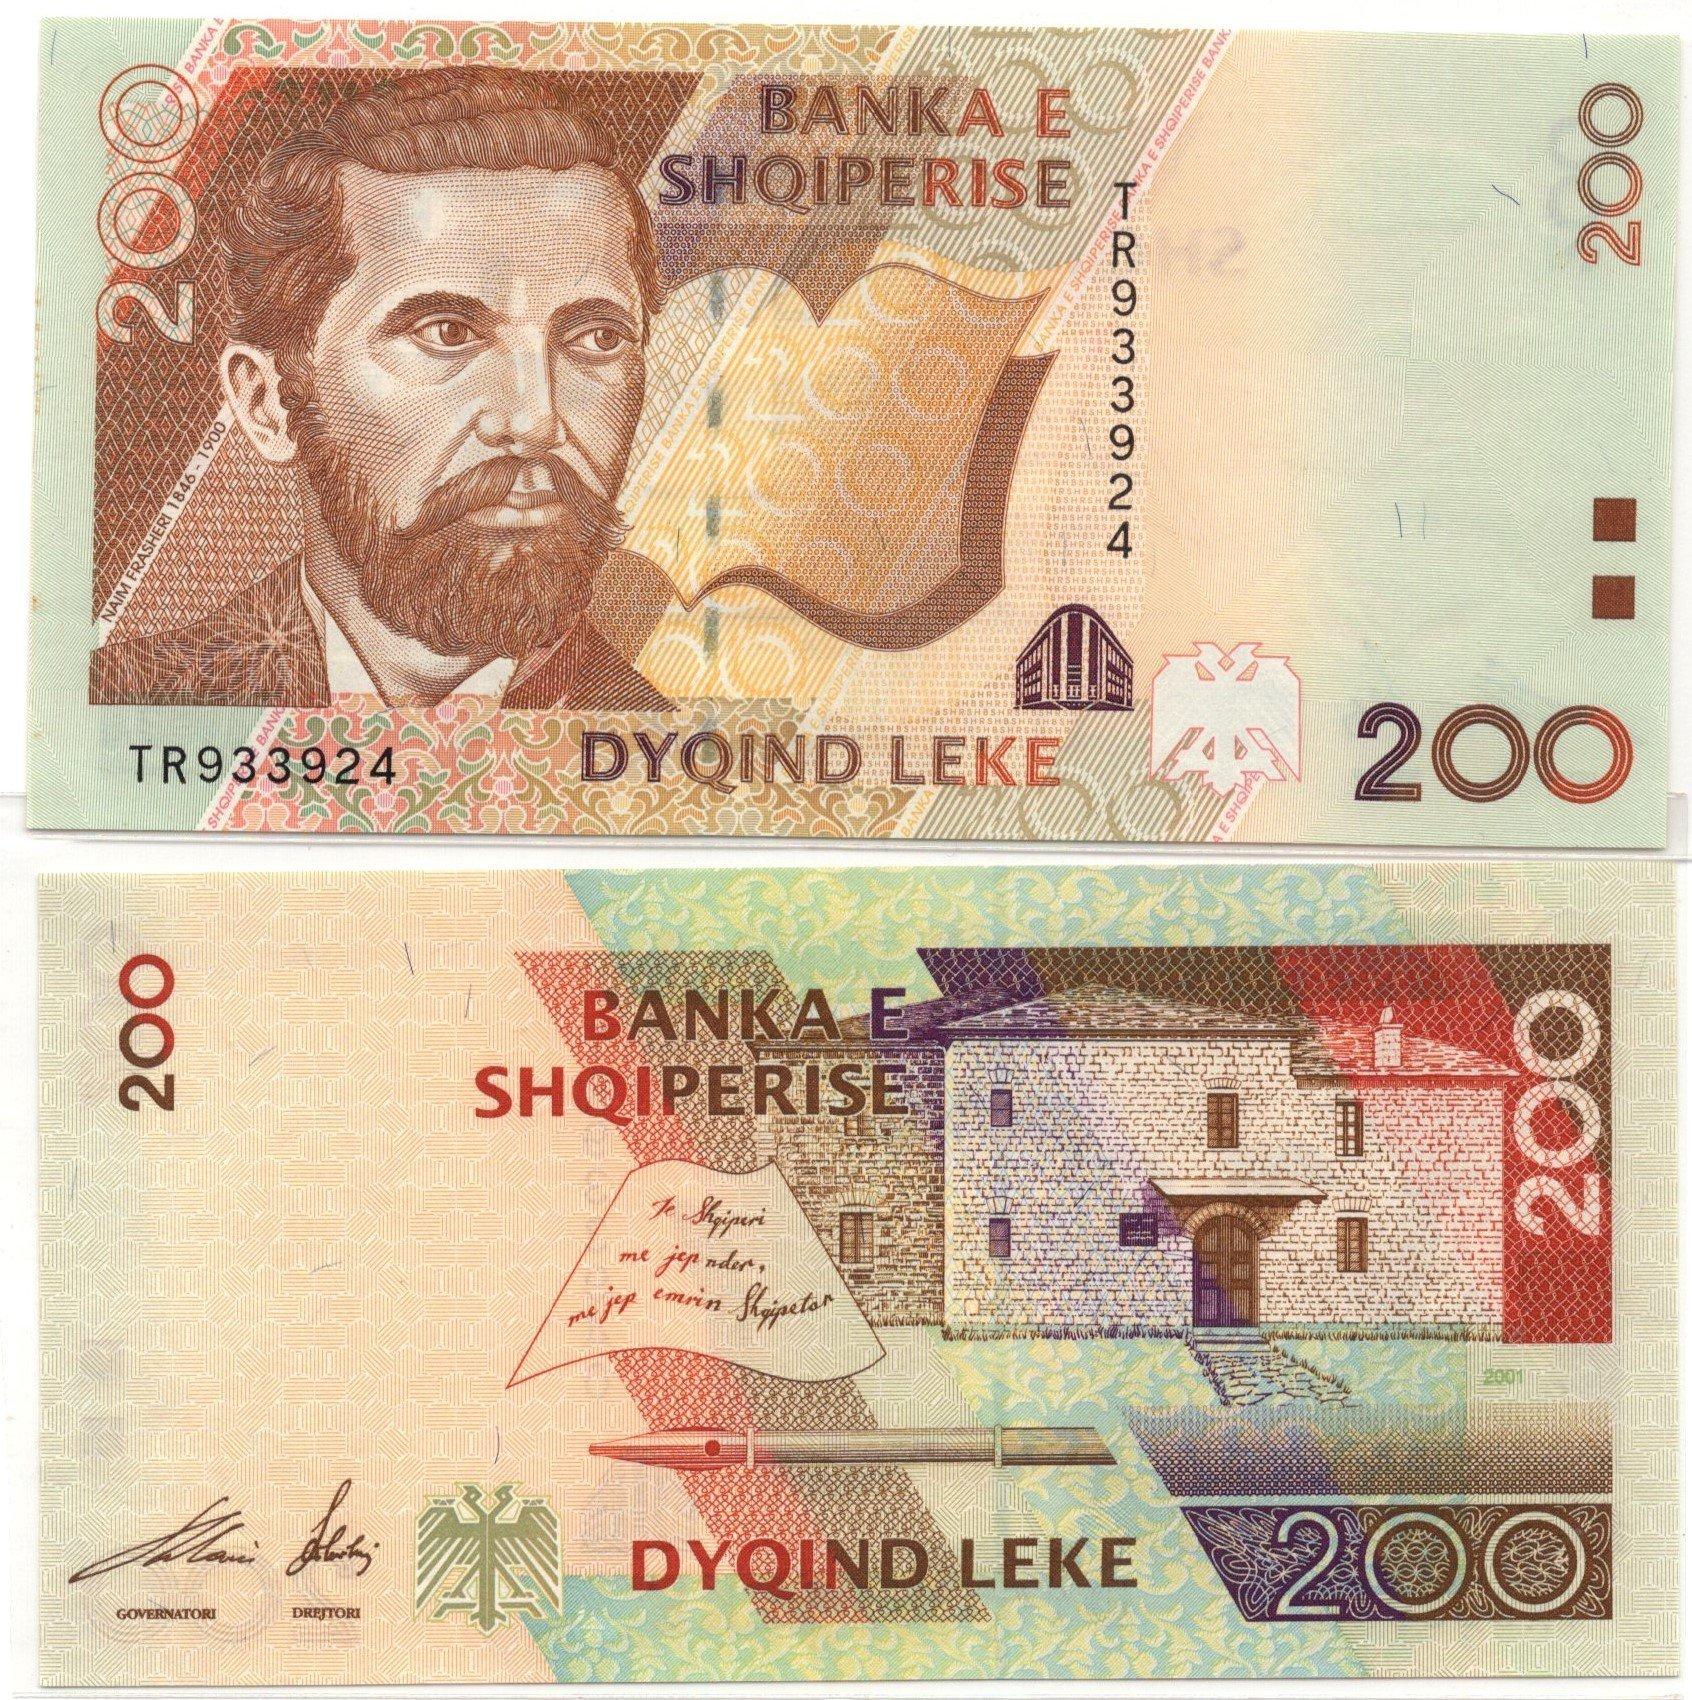 Albania 200 leke banknote